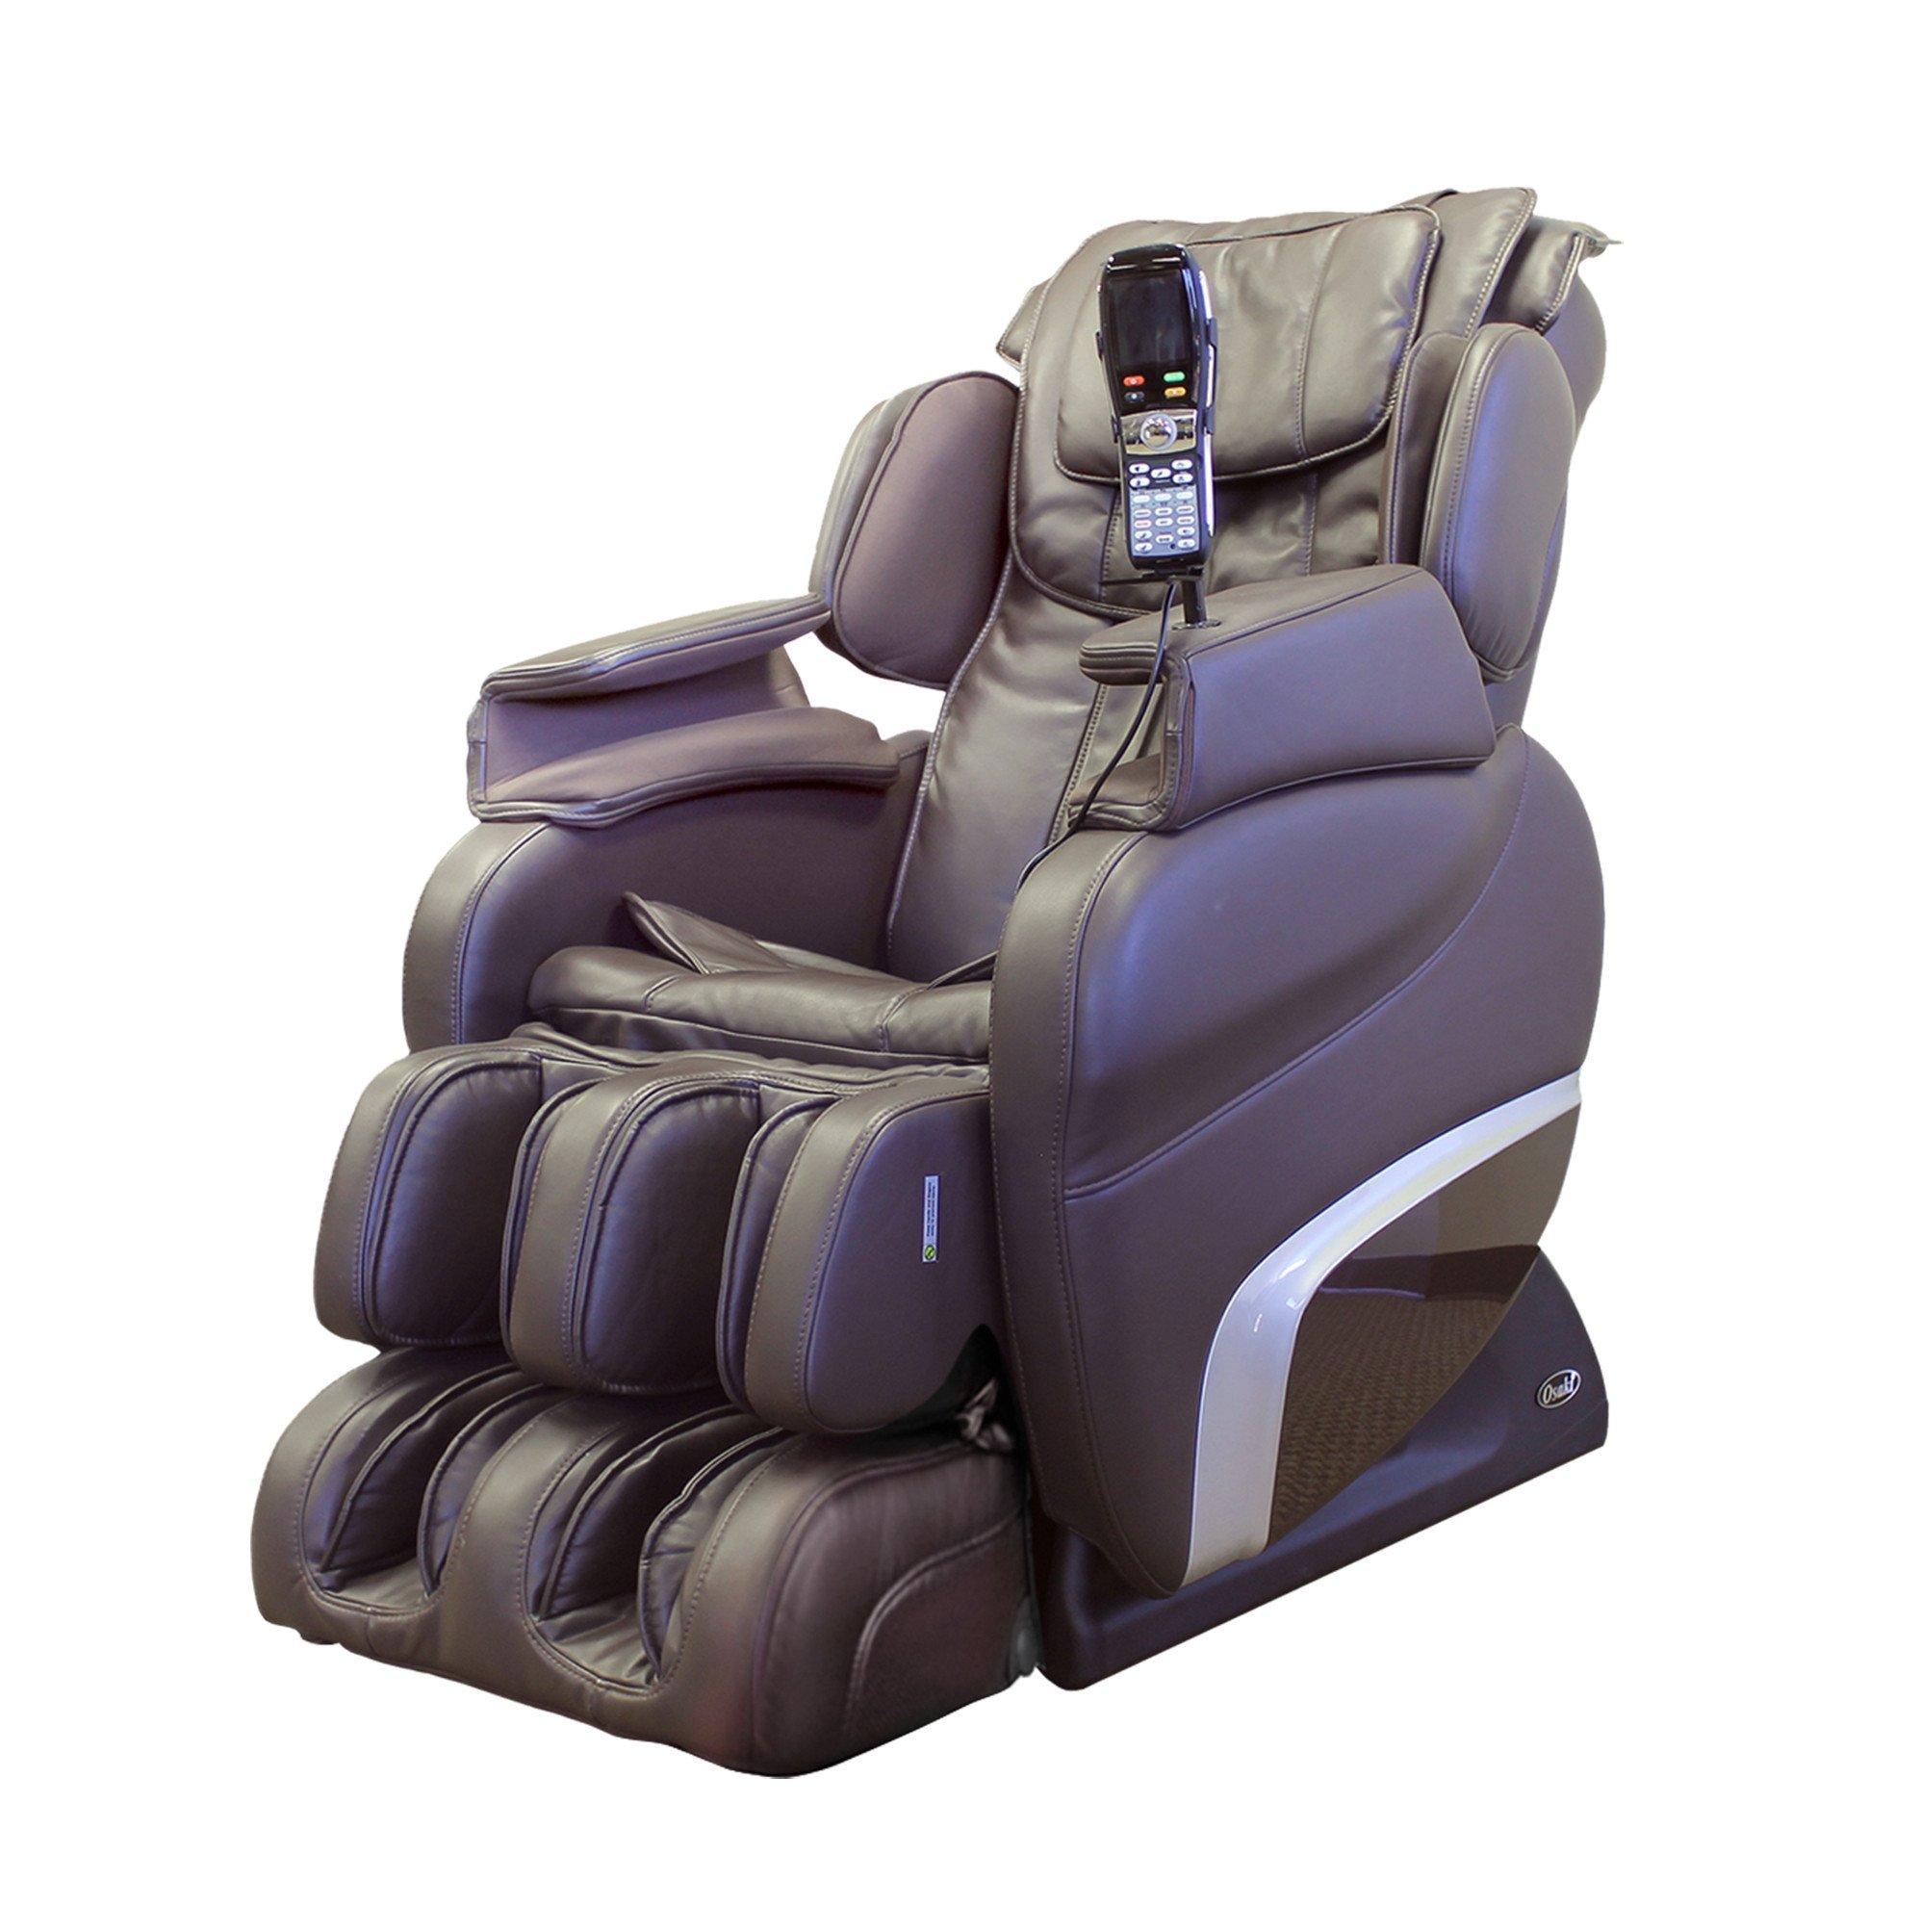 TITAN TI-7700R Zero Gravity Massage Chair